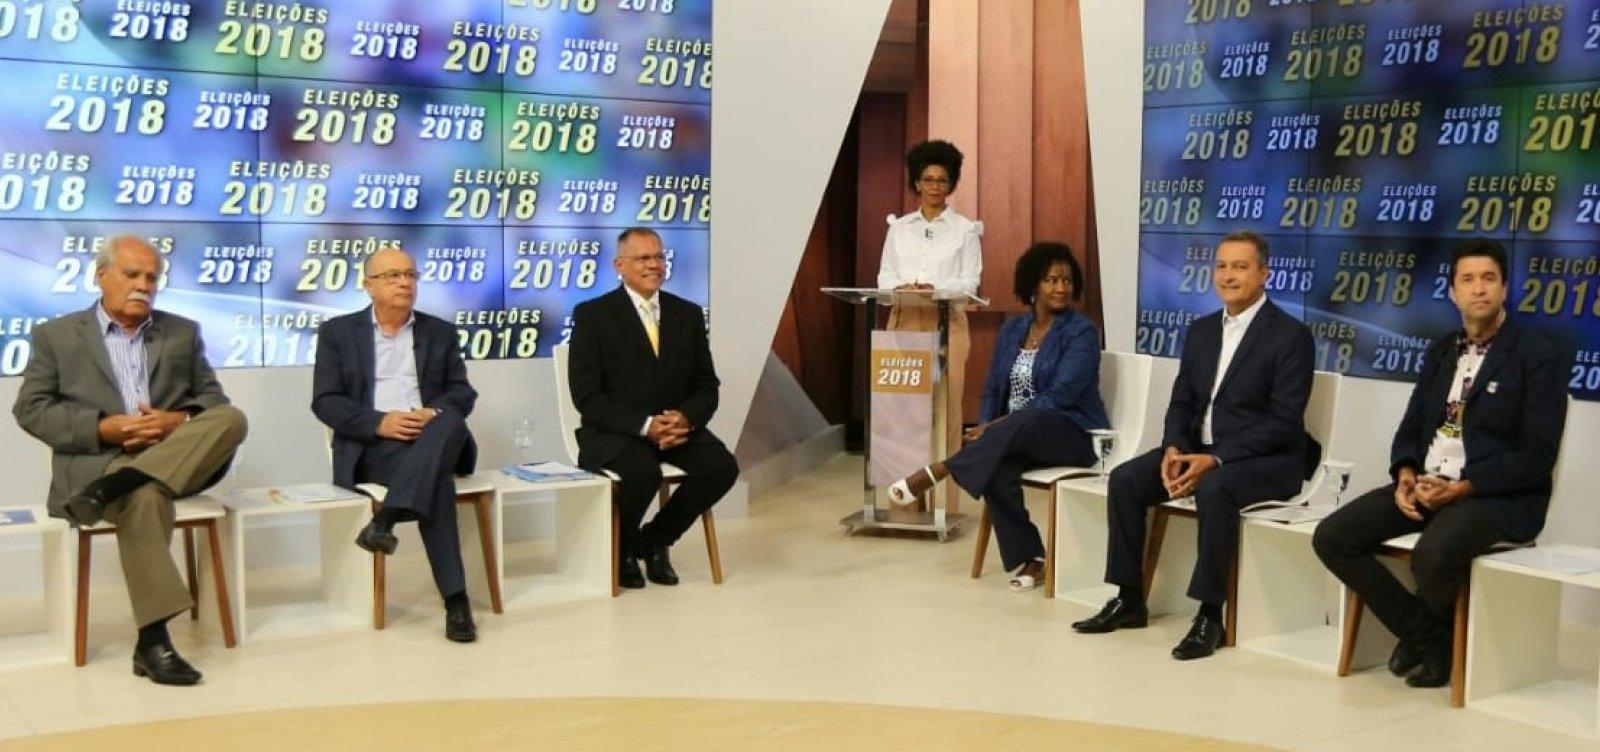 [Debate da TVE entre candidatos ao governo é marcado por poucos confrontos]